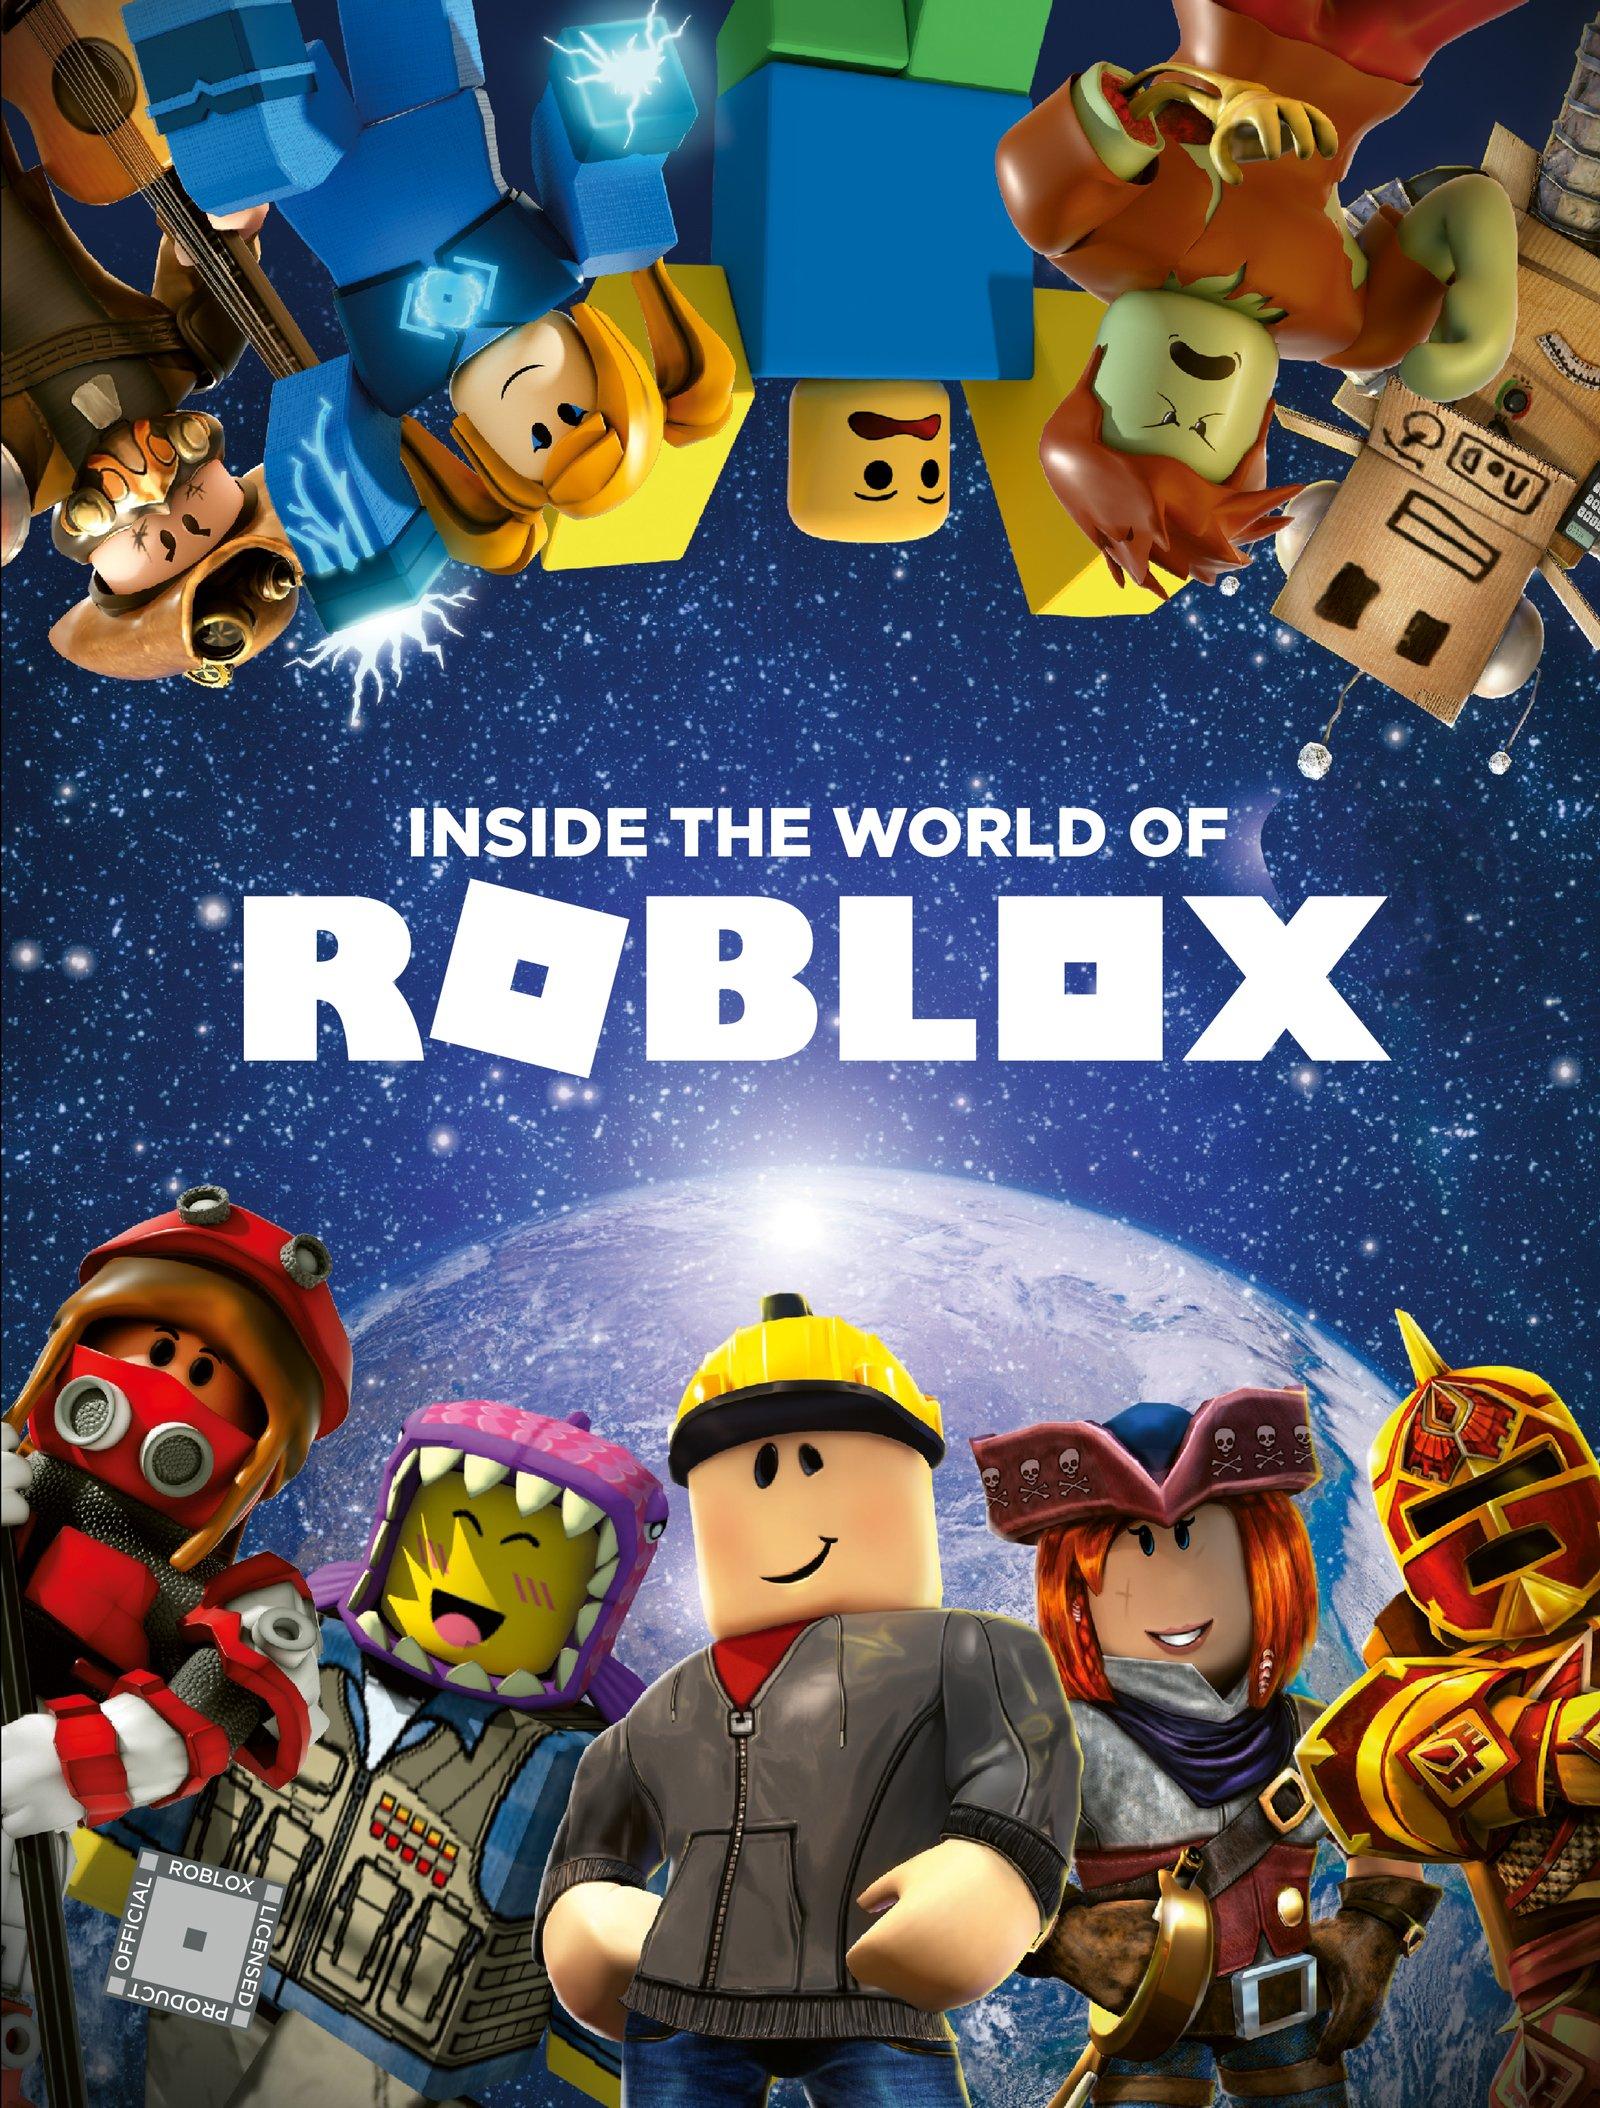 Inside The World Of Roblox Official Roblox Books Harpercollins 9780062862600 Amazon Com Books